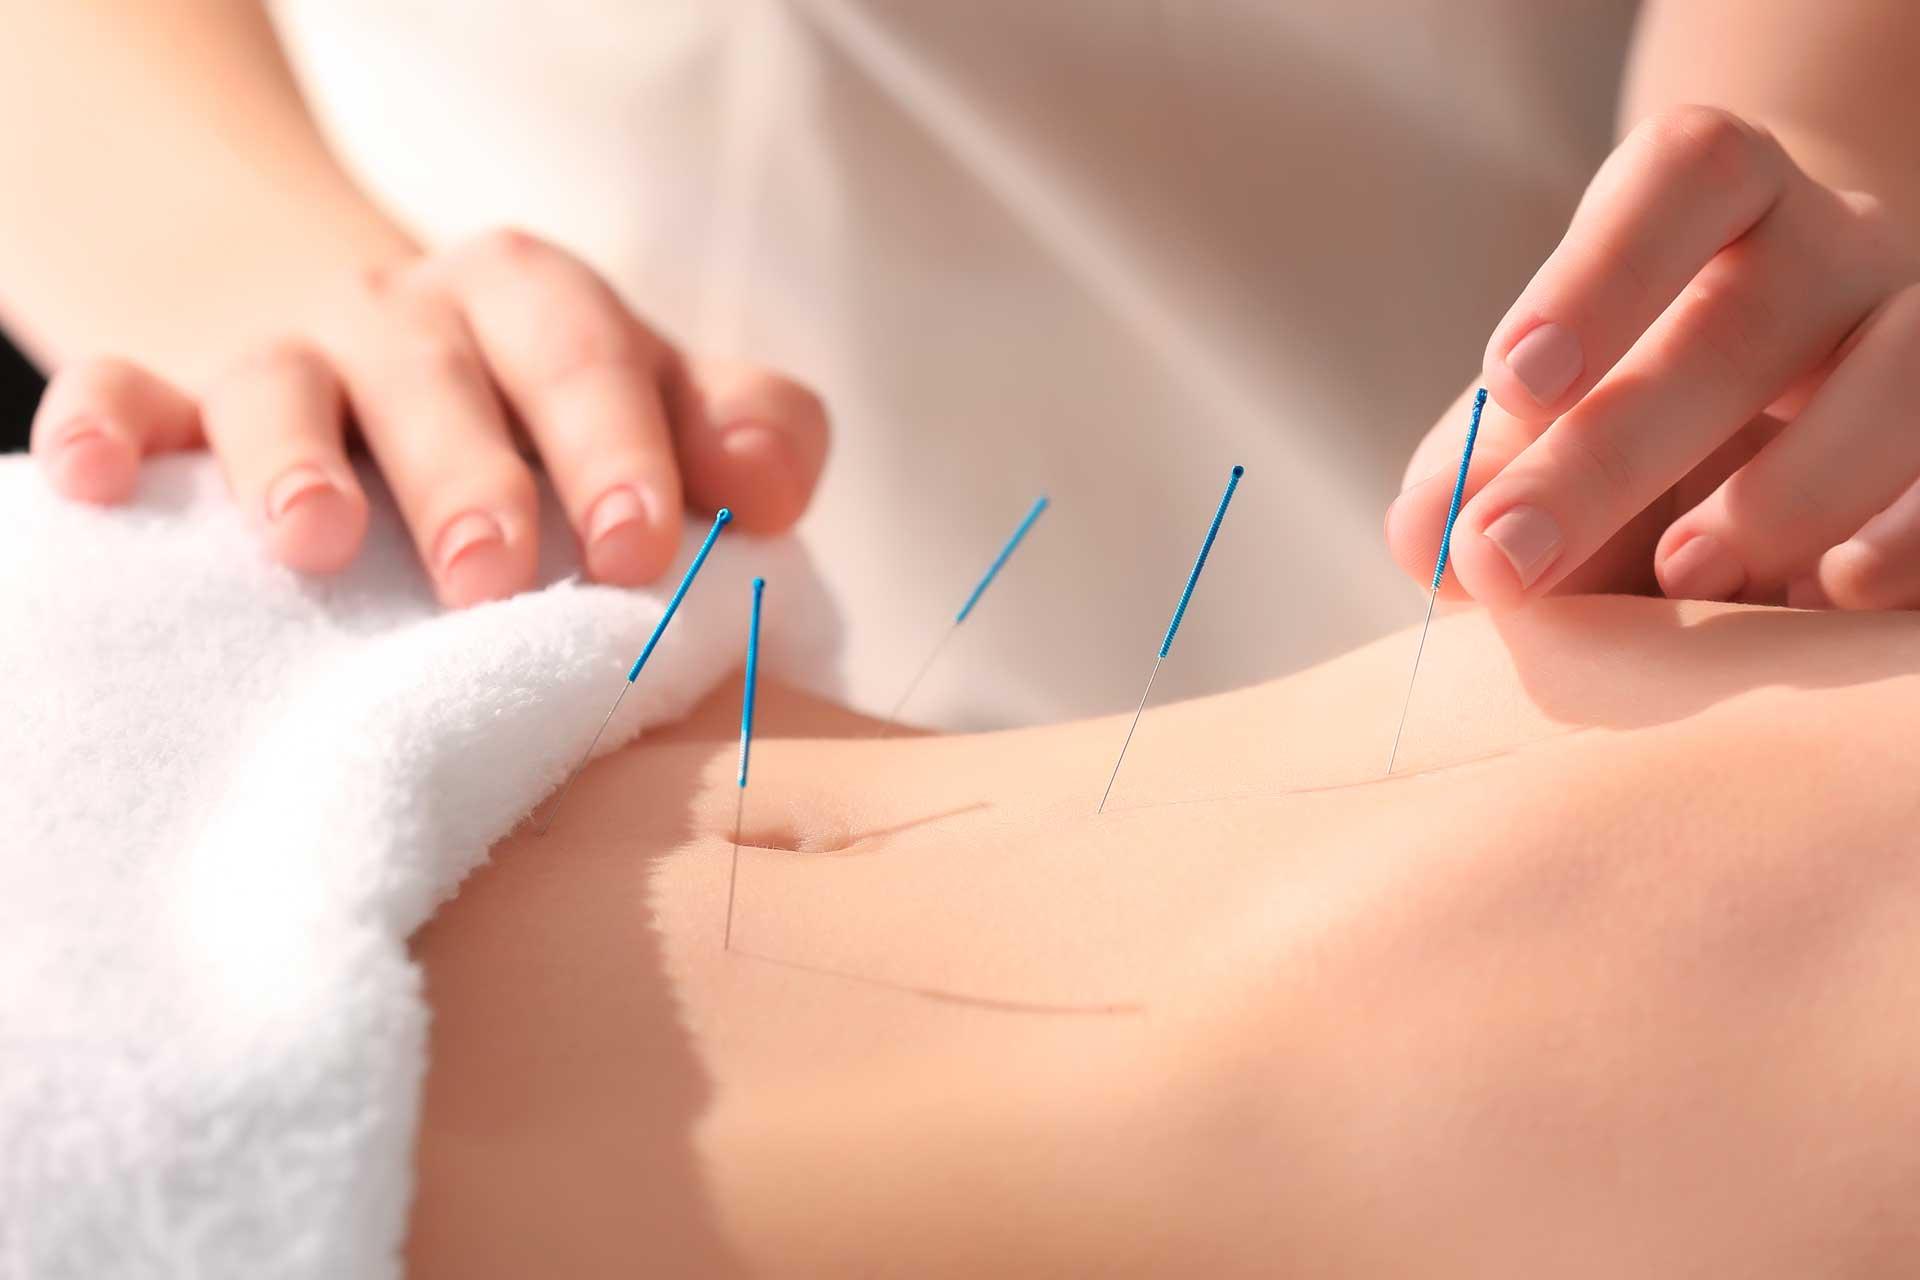 Dr-Di-Chen-Koenig-TCM-Akupunktur-Bauch